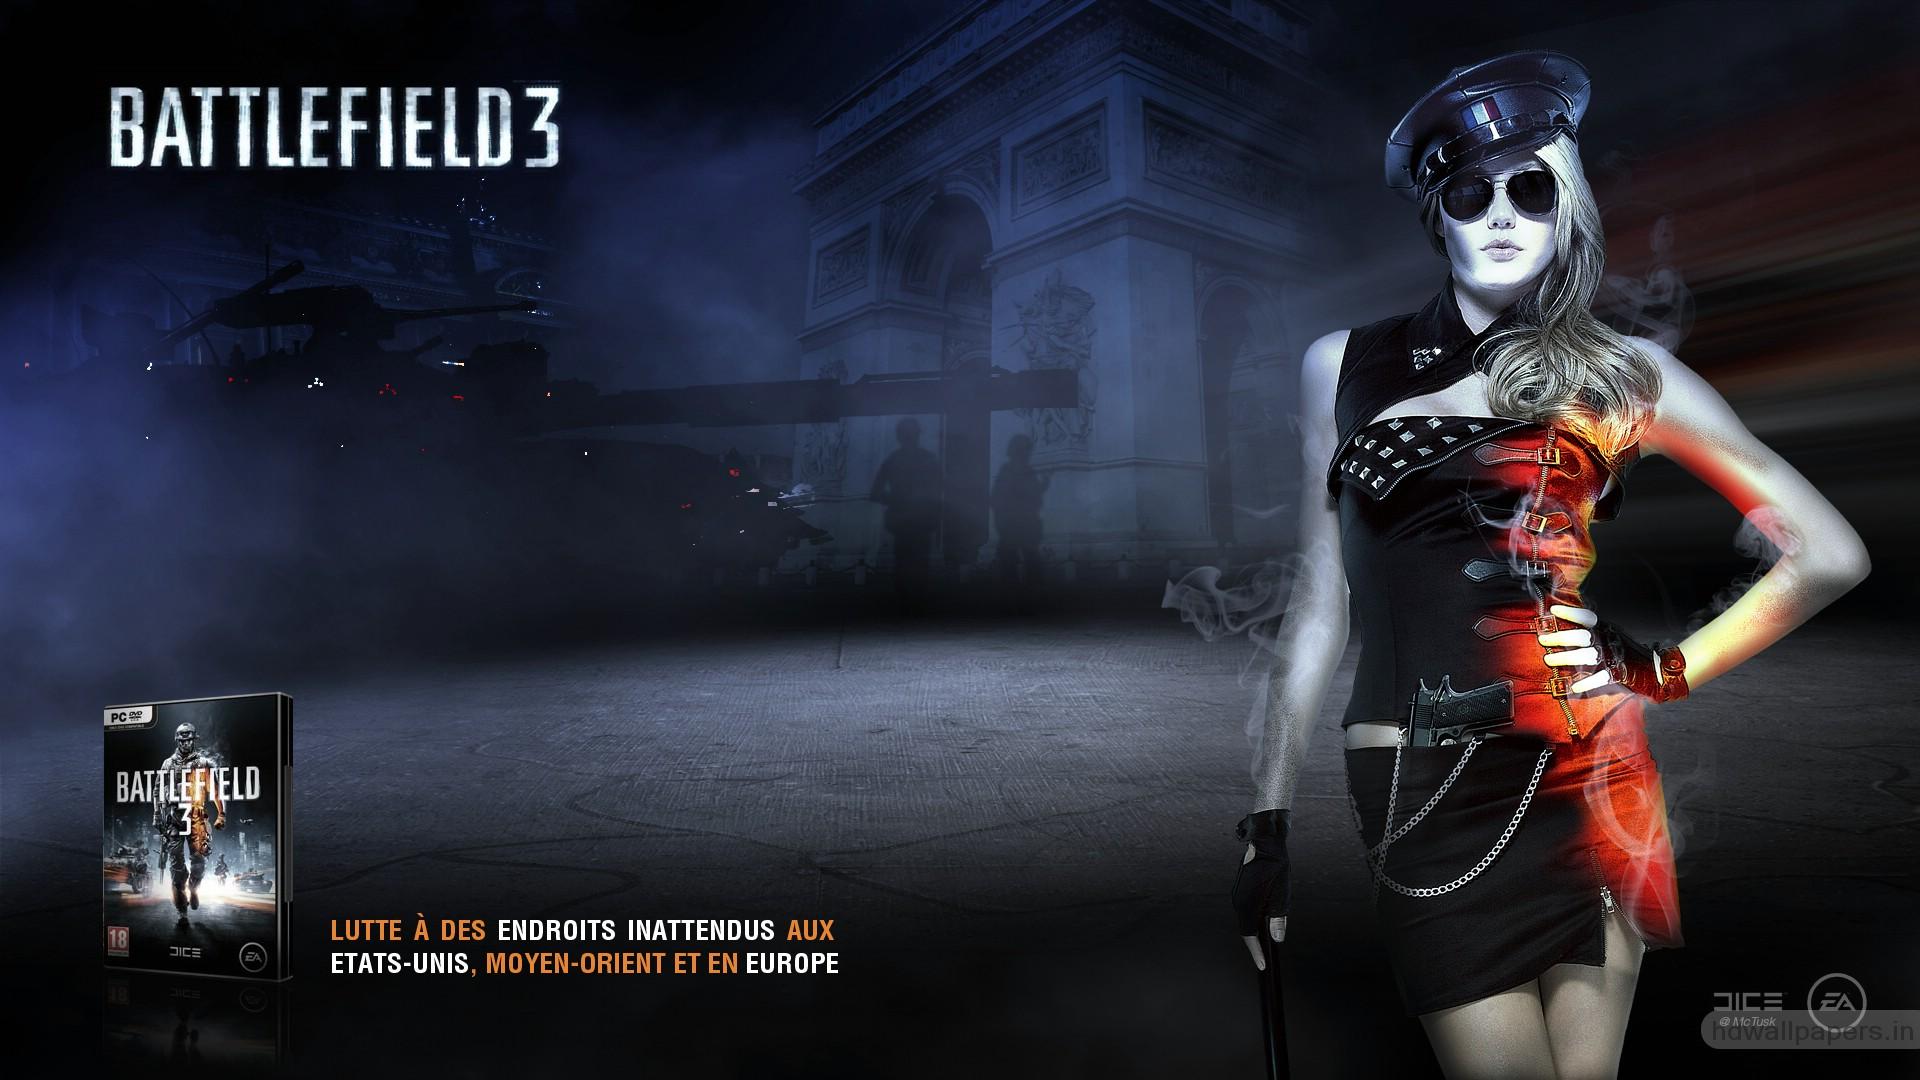 Post Titulado wallpapers de Battlefield 3 Bueno espero que les guste 1920x1080